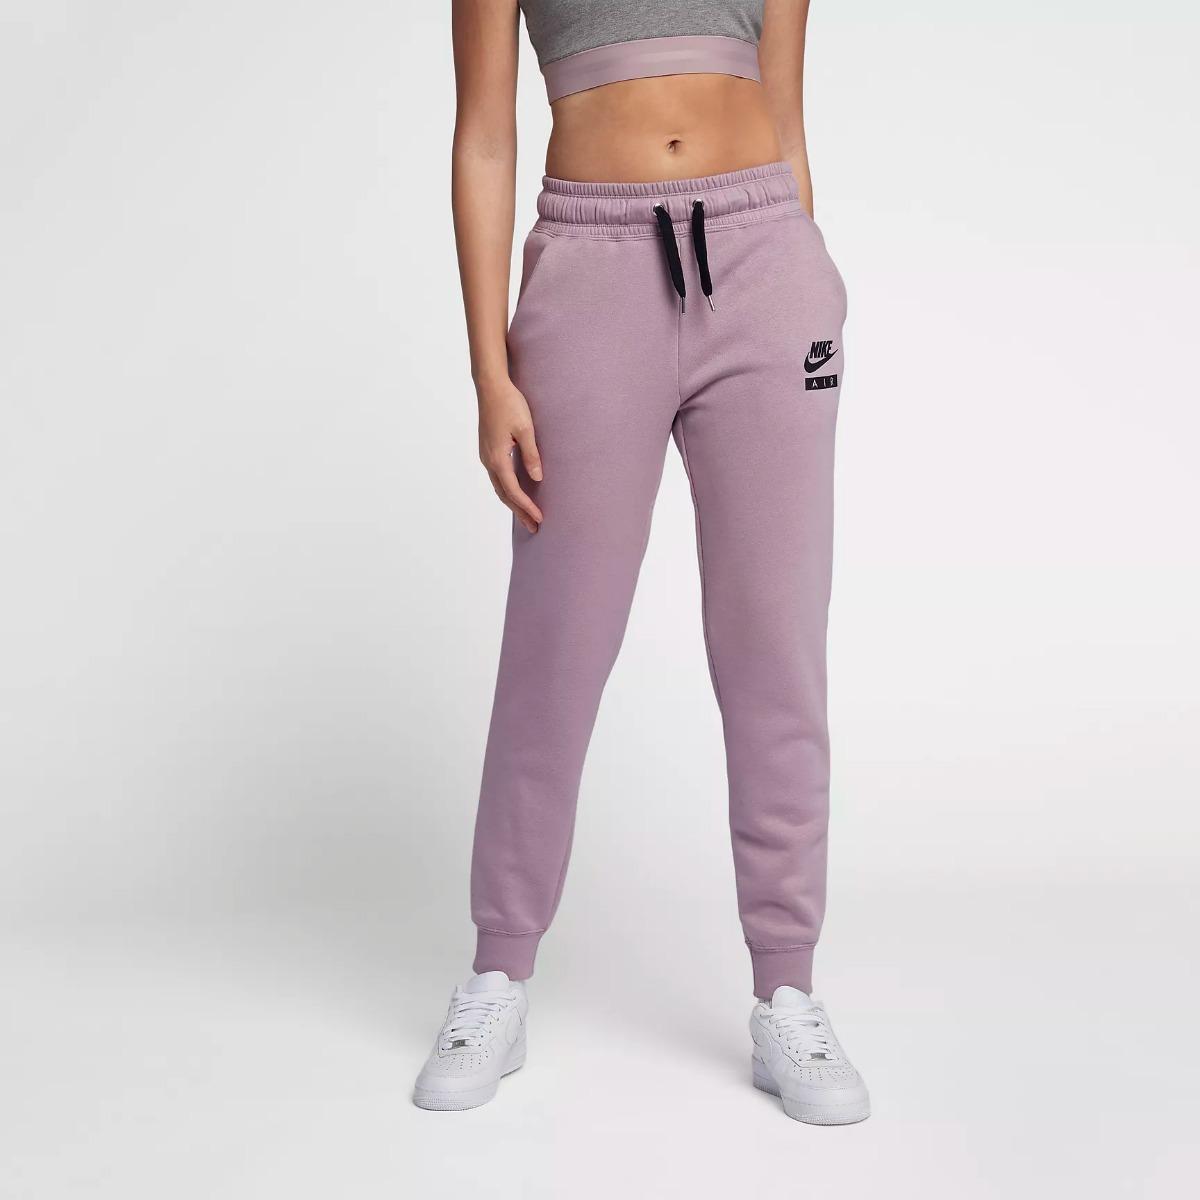 Pants Nike De Mujer Original - $ 1,599.00 en Mercado Libre